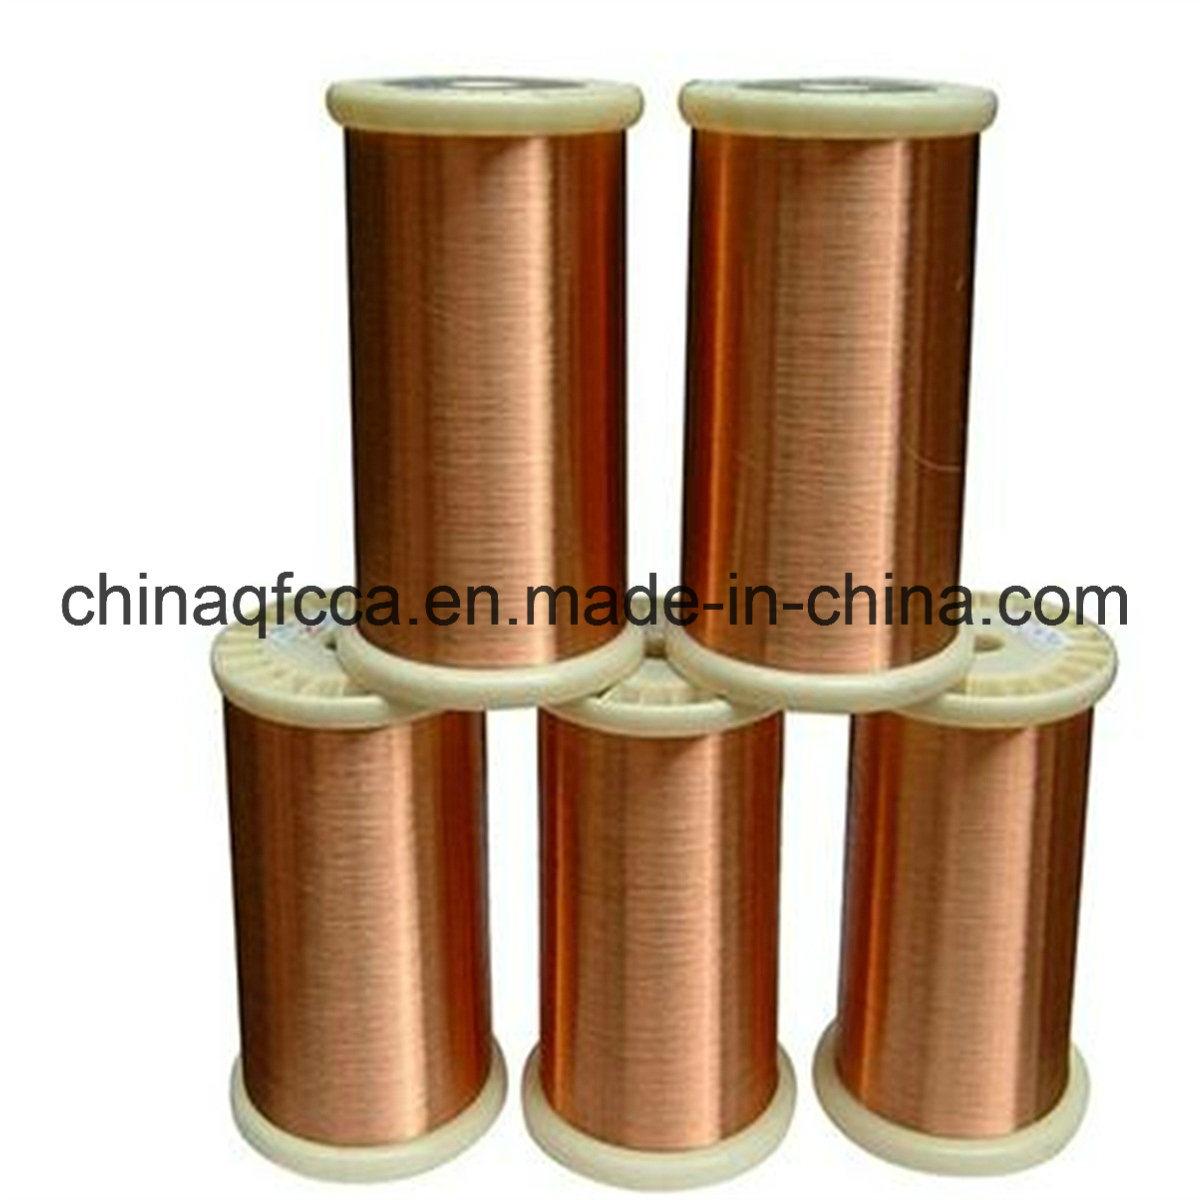 1.15mm Enameled Copper Clad Aluminum Wire (ECCA)